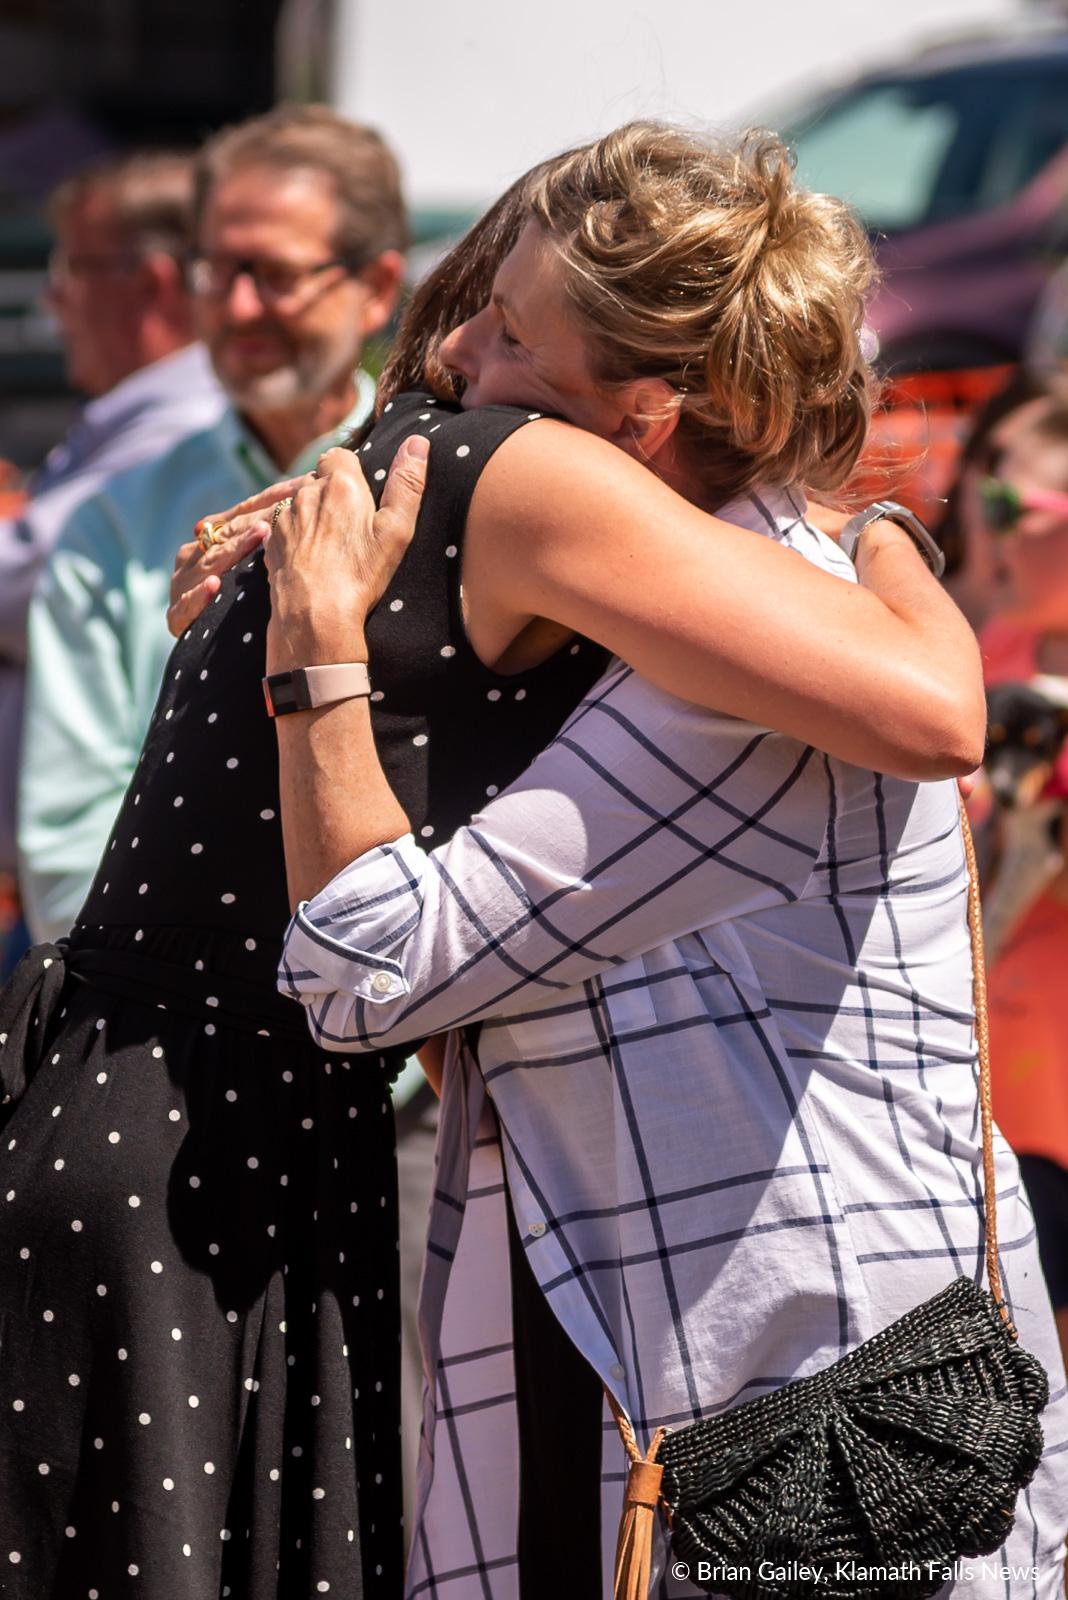 Katherine Pope and Heidi VanDyke embrace in a hug following the ribbon cutting of the Klamath Commons Park. July 1, 2019 (Image, Brian Gailey / Klamath Falls News)